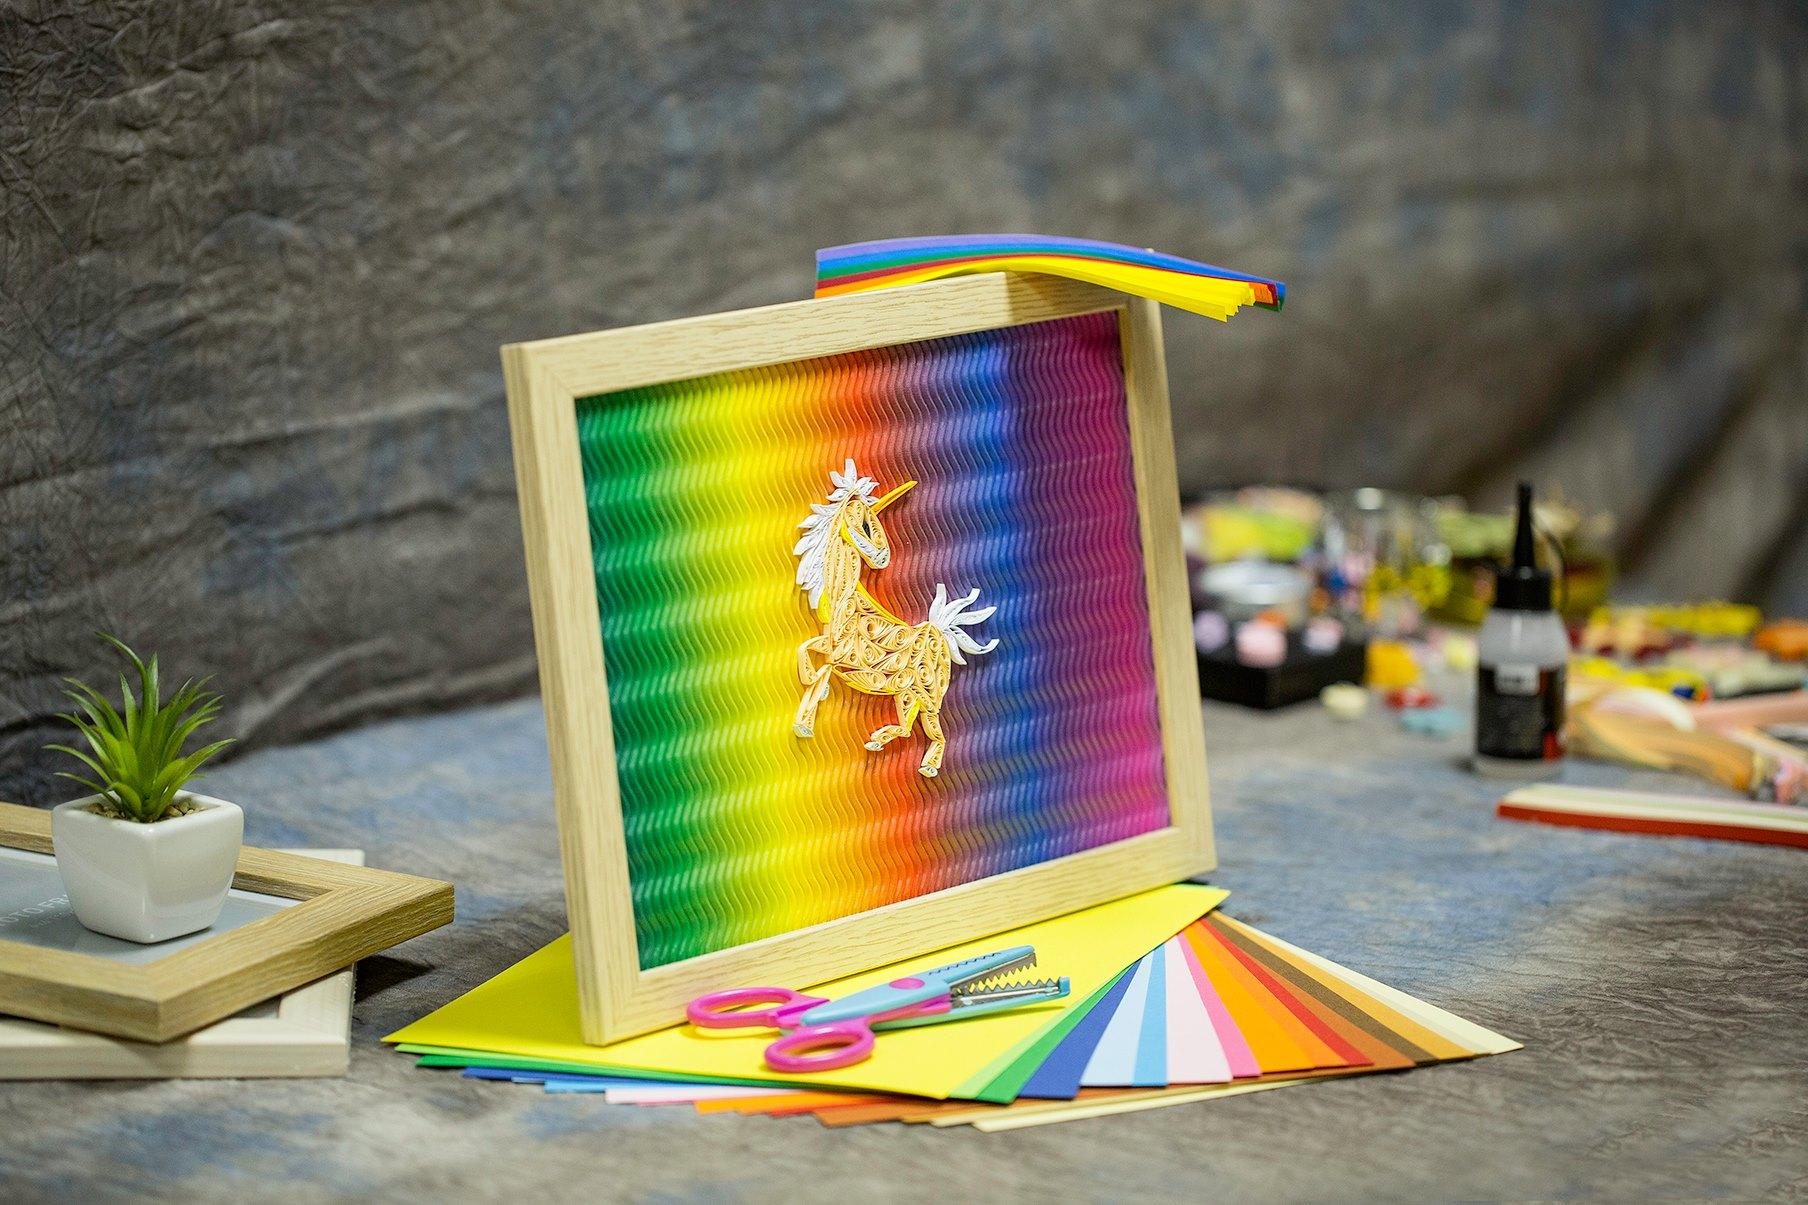 fotokruzok-levice-fotokurzy-ukazky-fotiek-na-uvode-06